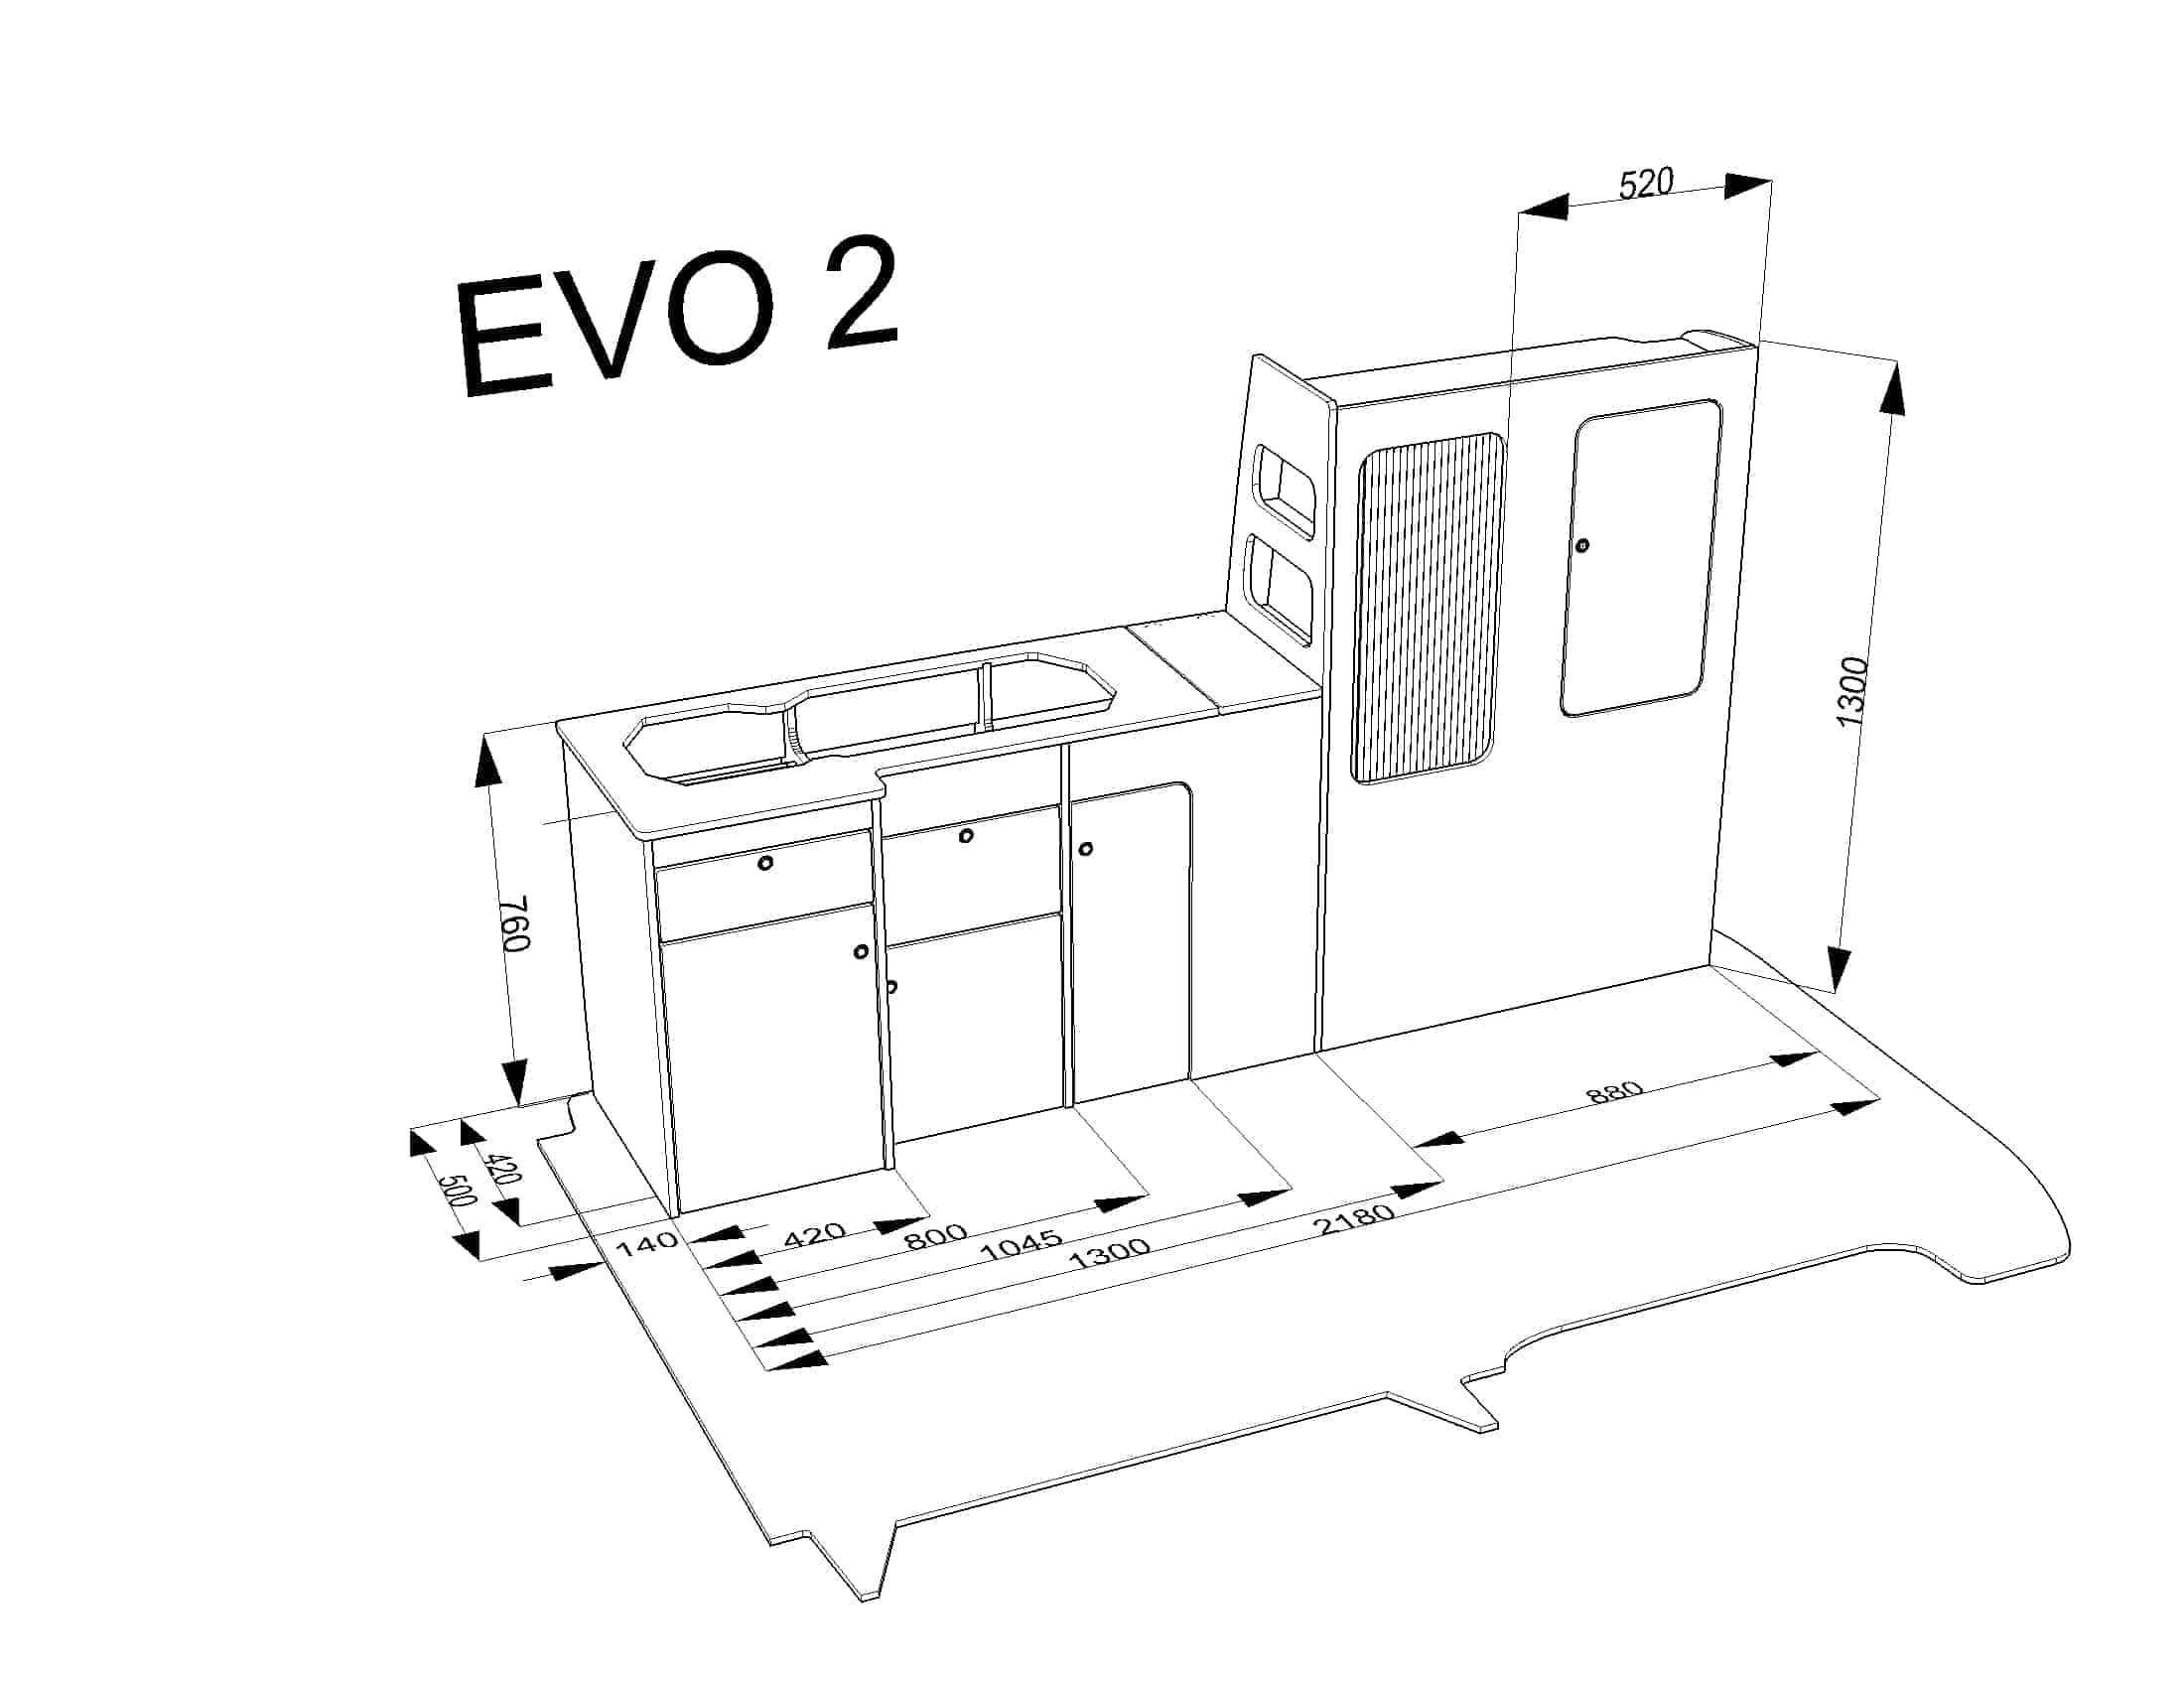 Evo 2 4 Vw Swb Evo Design